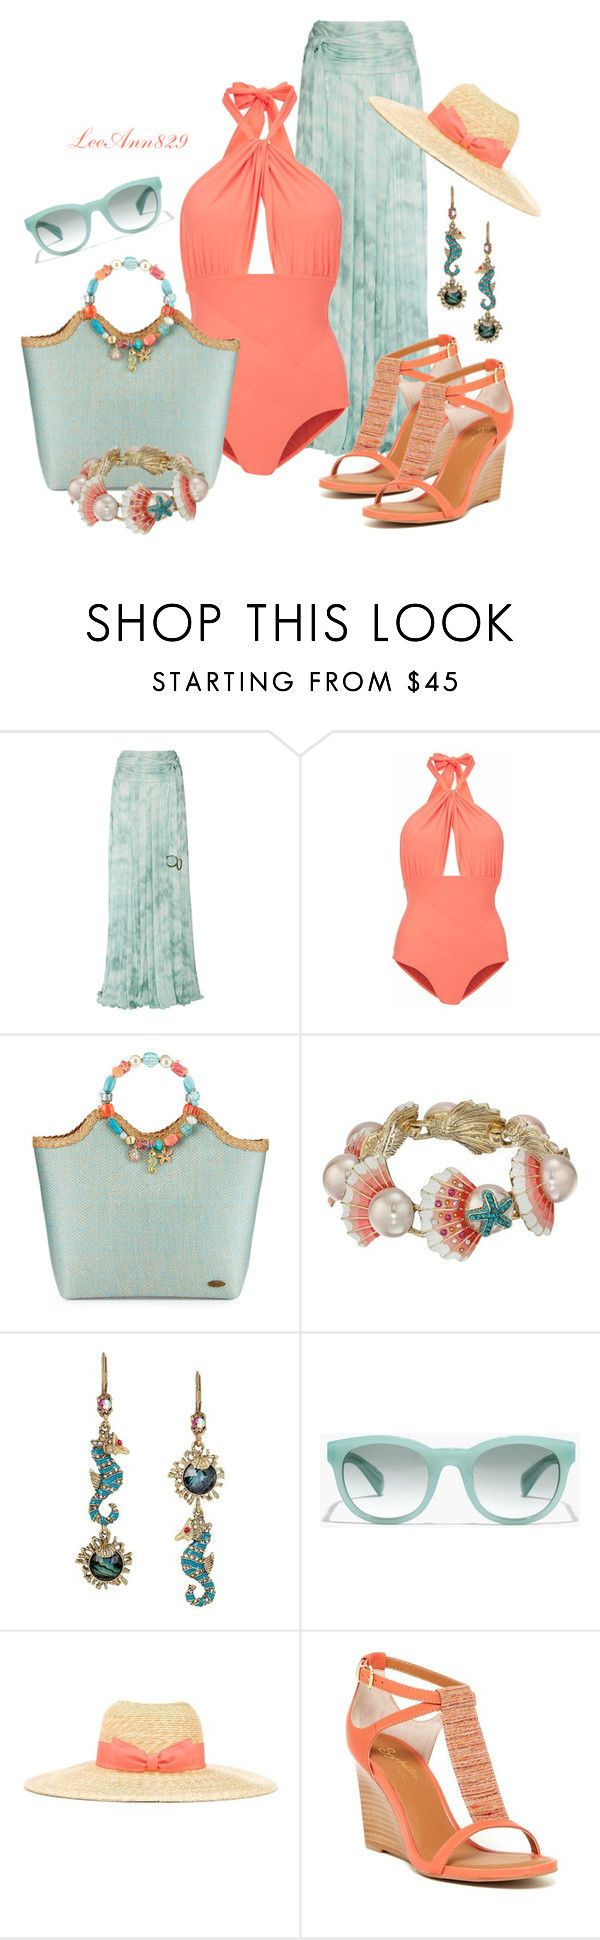 """swimwear"" by leeann829 ❤ liked on Polyvore featuring Roberto Cavalli, Lilliput & Felix, Cappelli, Betsey Johnson, J.Crew, Lanvin and Seychelles"